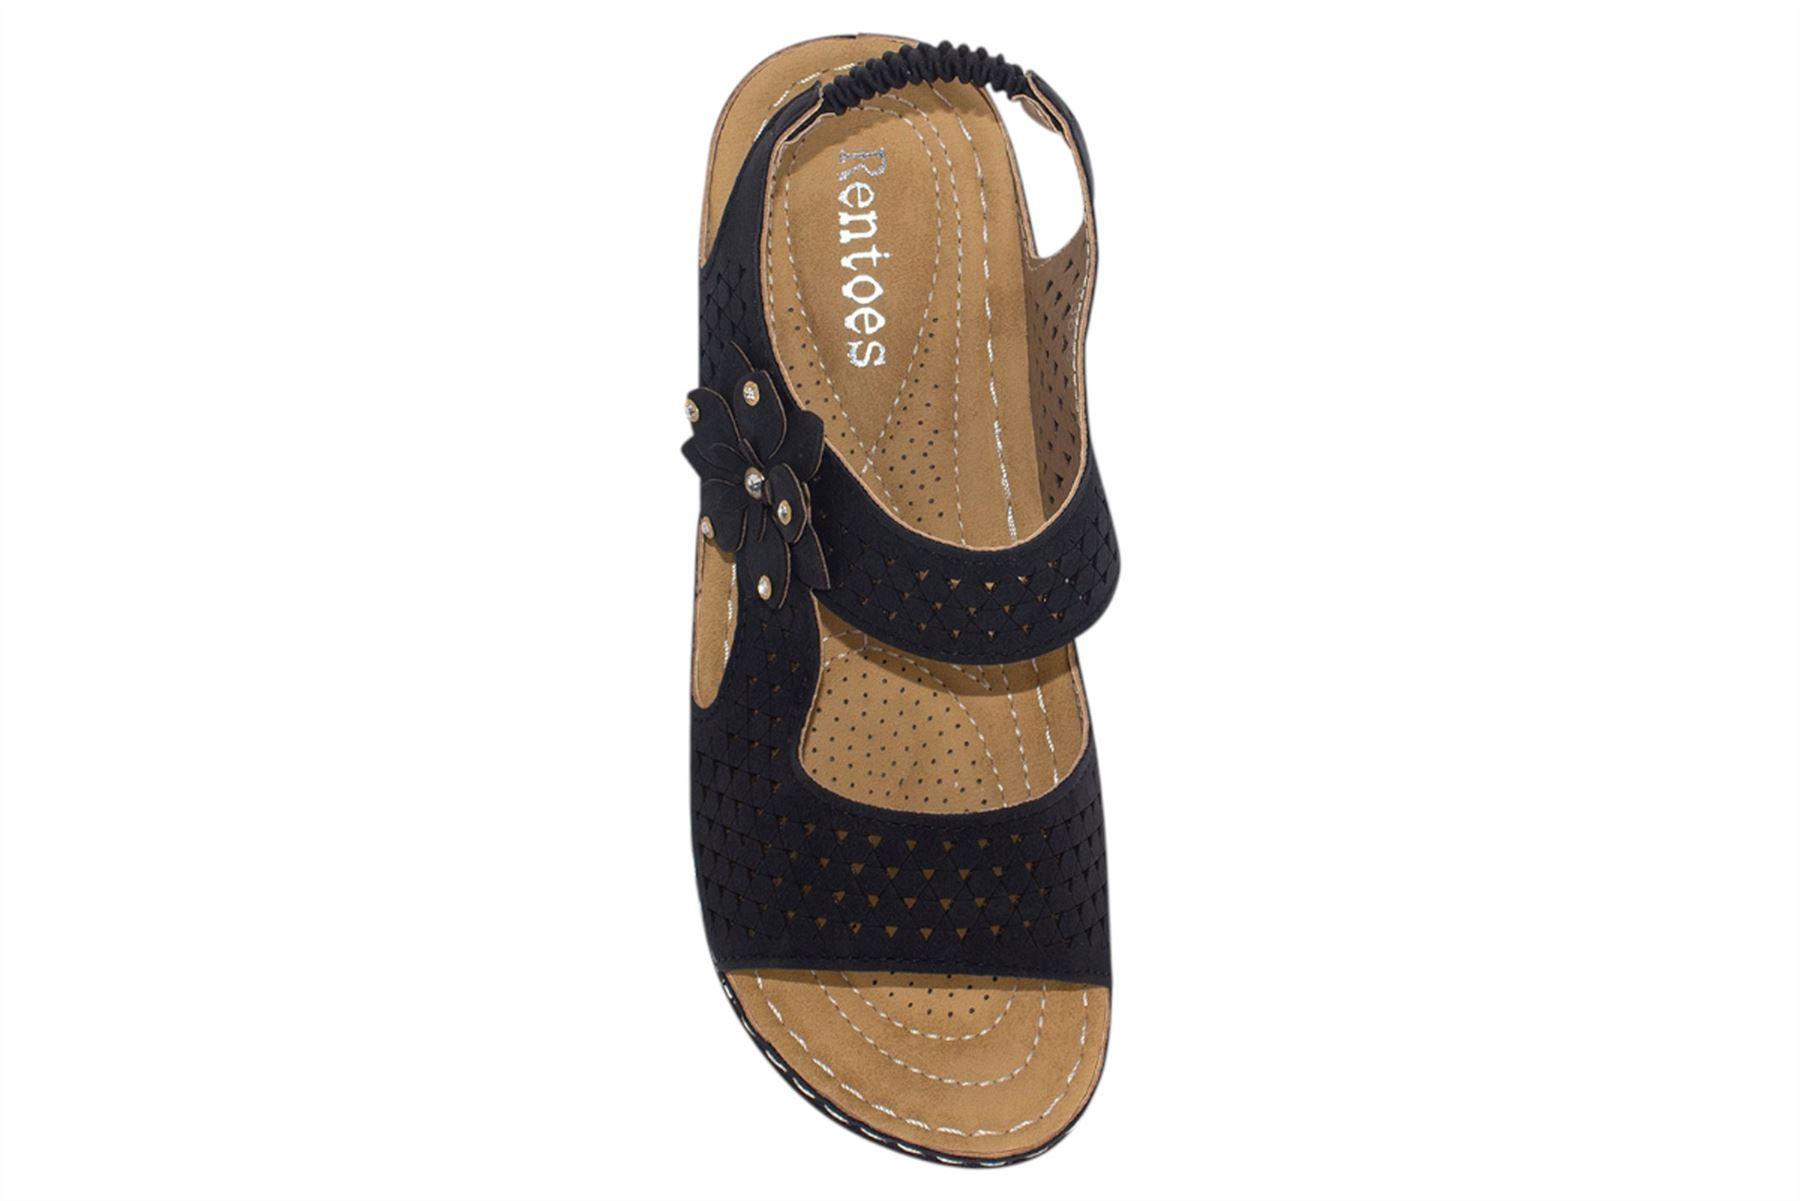 Womens Wedge Heel Sandal Ladies Comfort Cushion Strapy Summer Beach Casual Wear